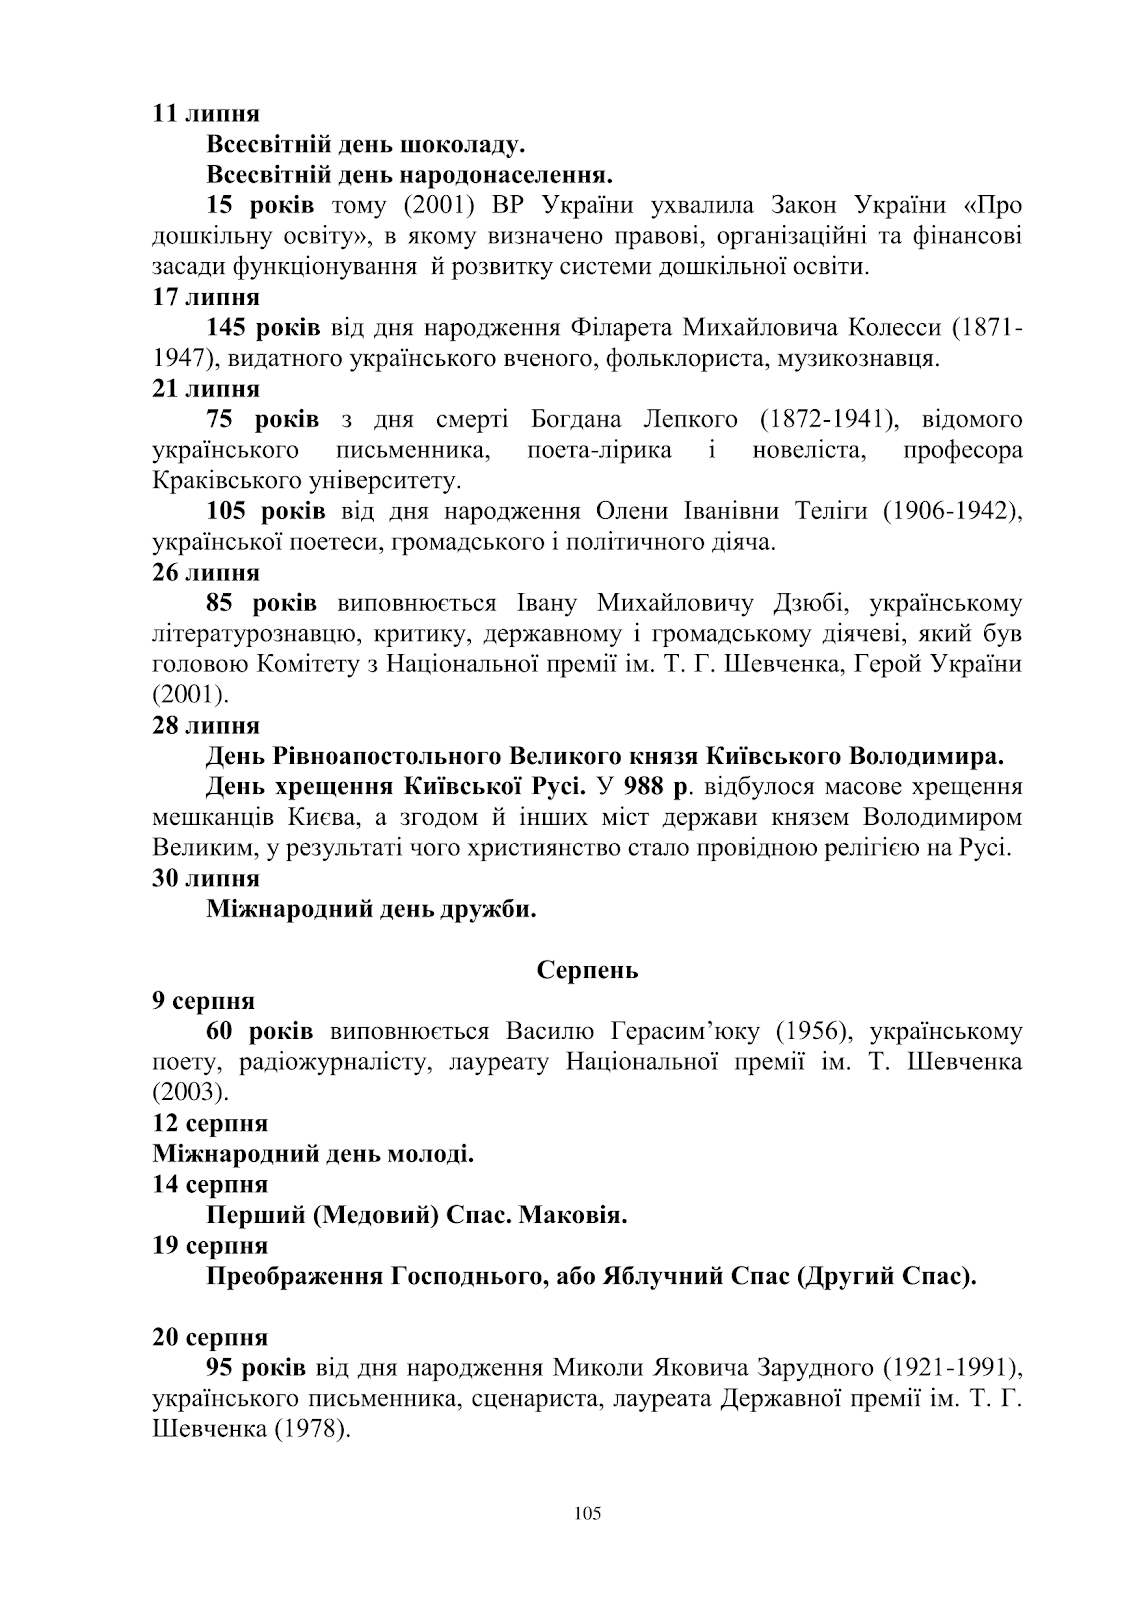 C:\Users\Валерия\Desktop\план 2016 рік\план 2016 рік-105.png